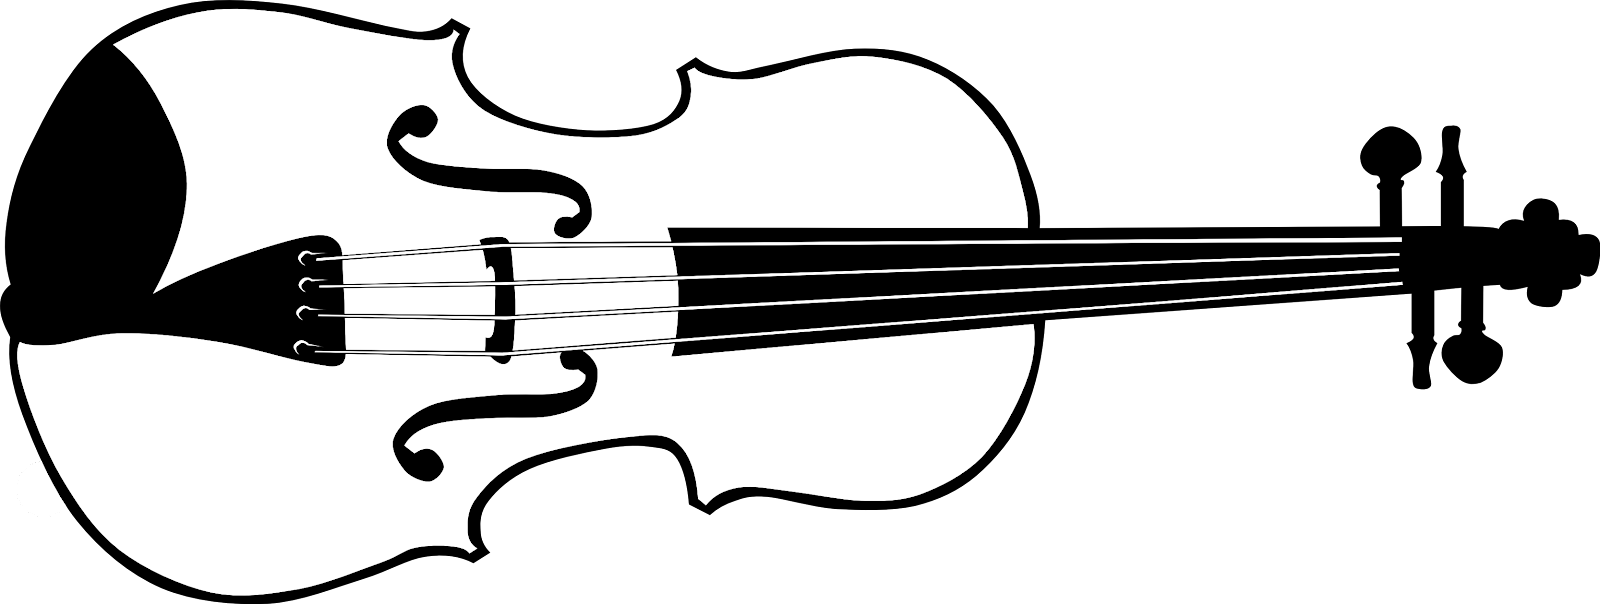 Violinphoto.png